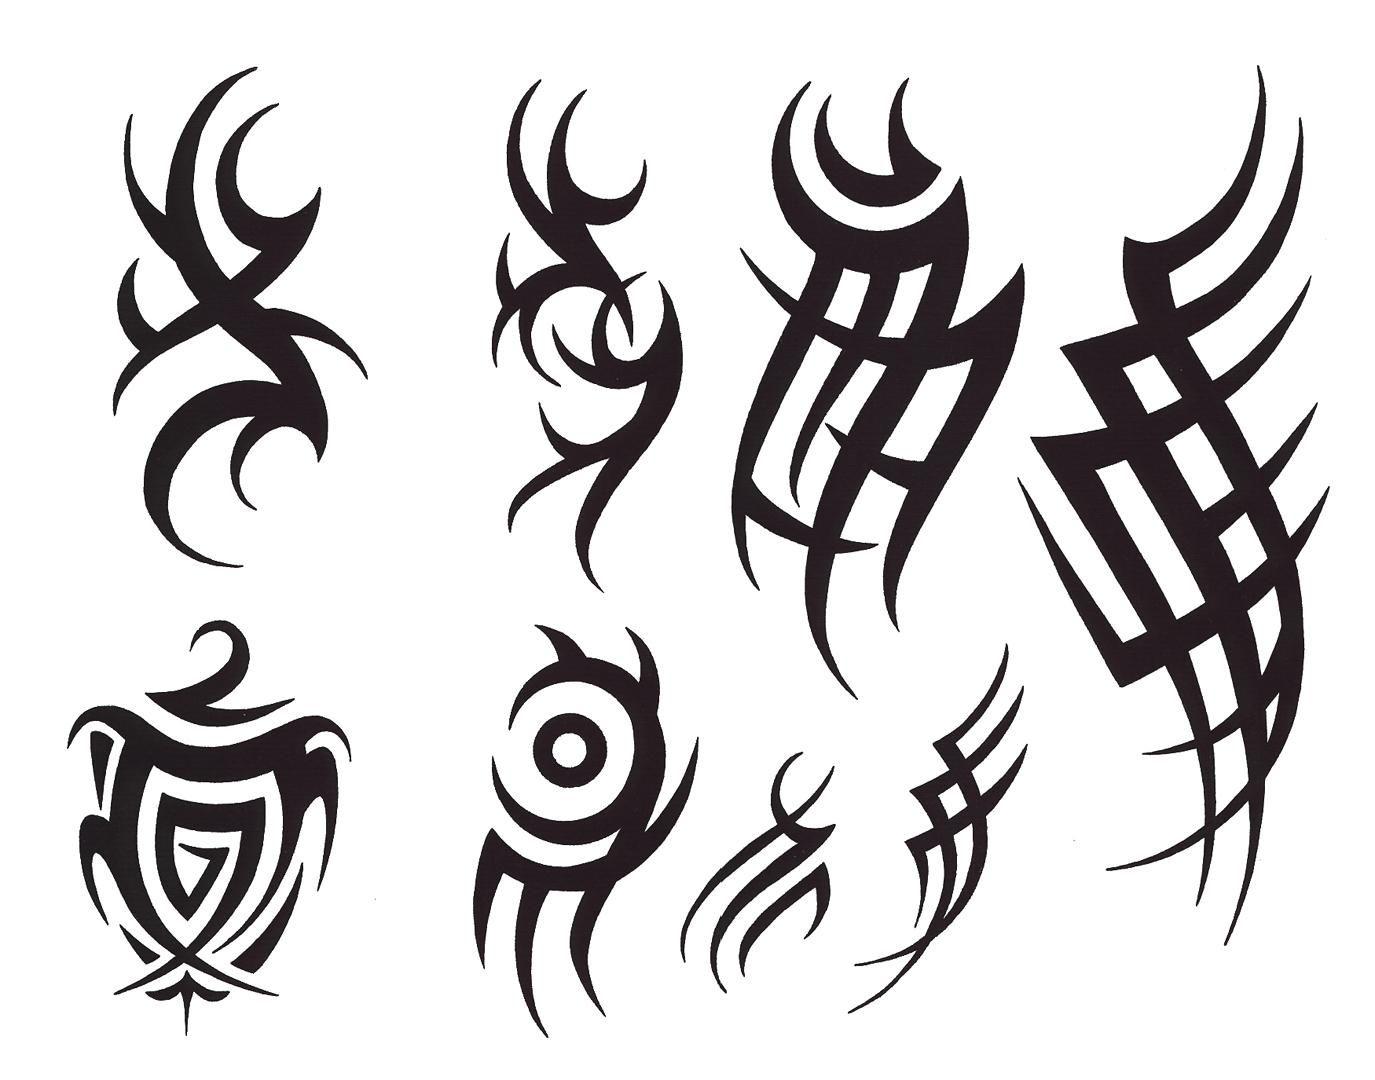 Henna tattoo designs for men - Tribal Tattoos Designs For Men